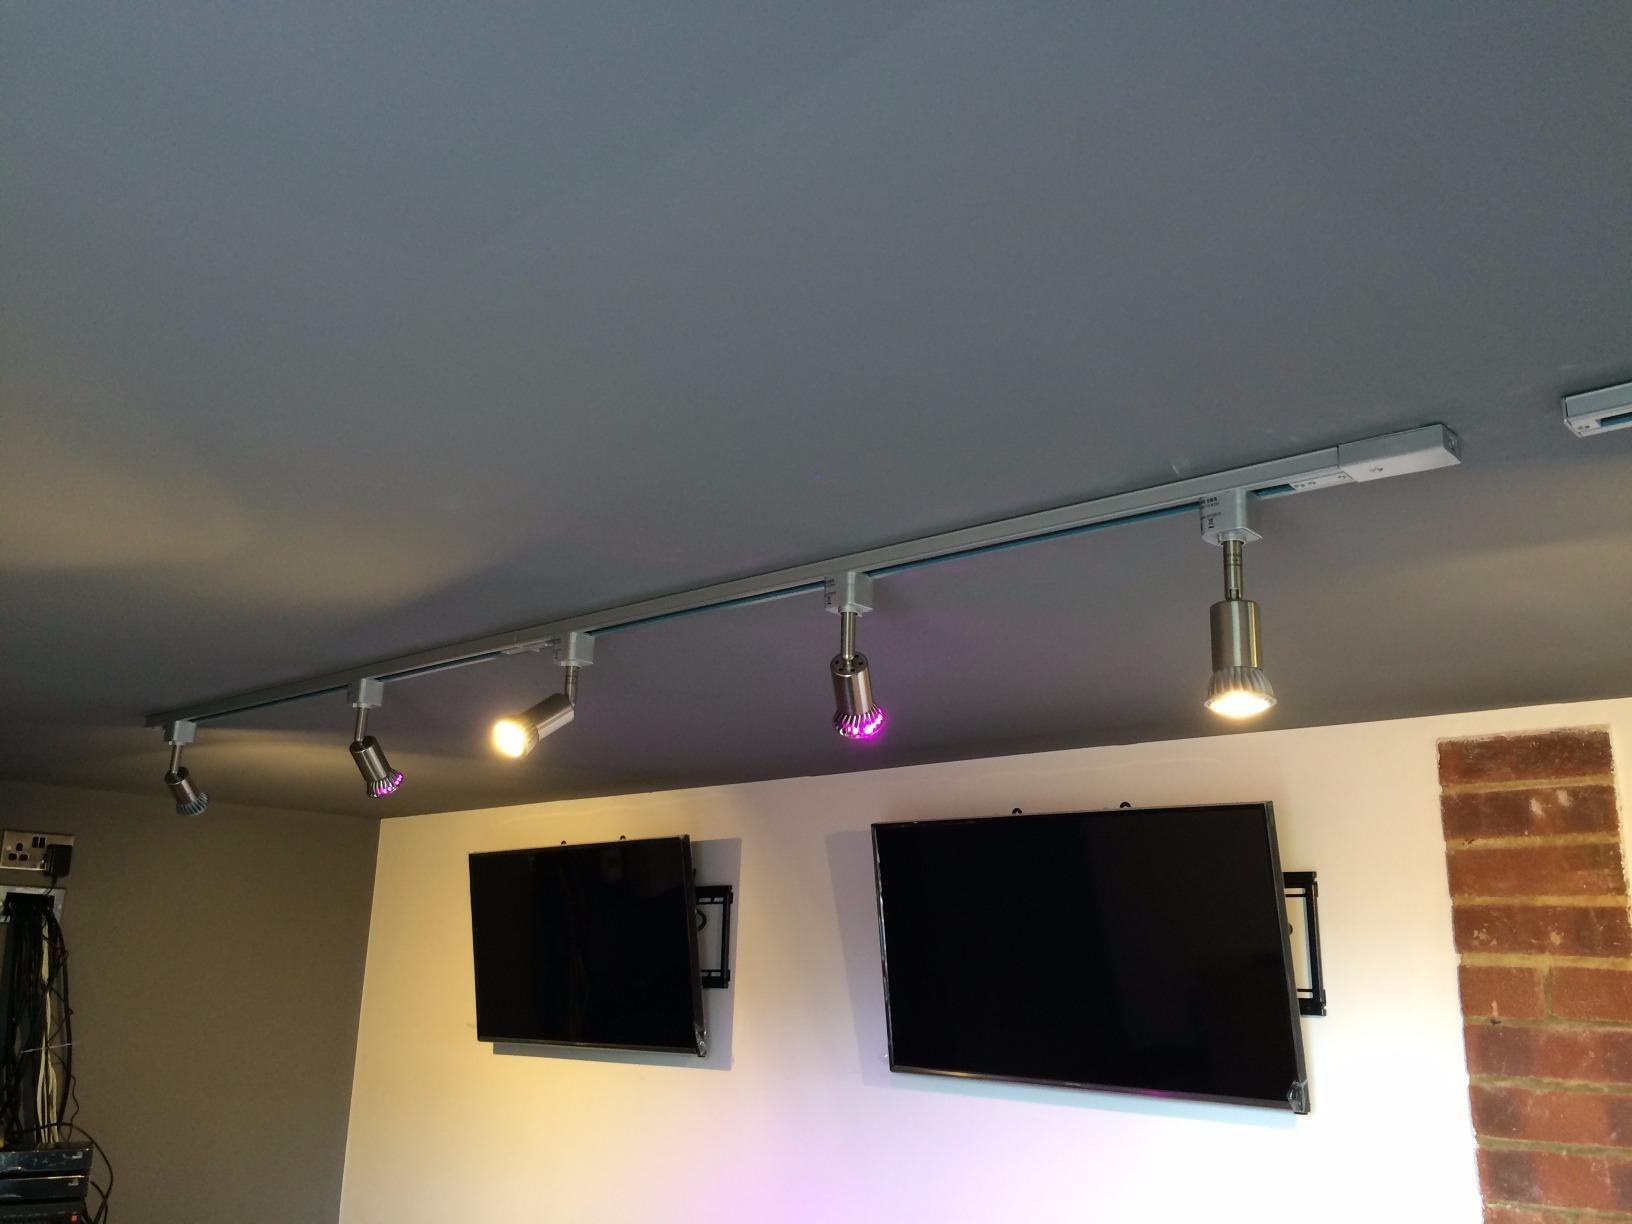 Gu10 Led Light Bulbs 6w 2700k Warm White Romantic Glow 500lm 50w Halogen Spotlights Equivalent 1 Year Payback Tim Track Lighting Spotlight Bulbs Downlights